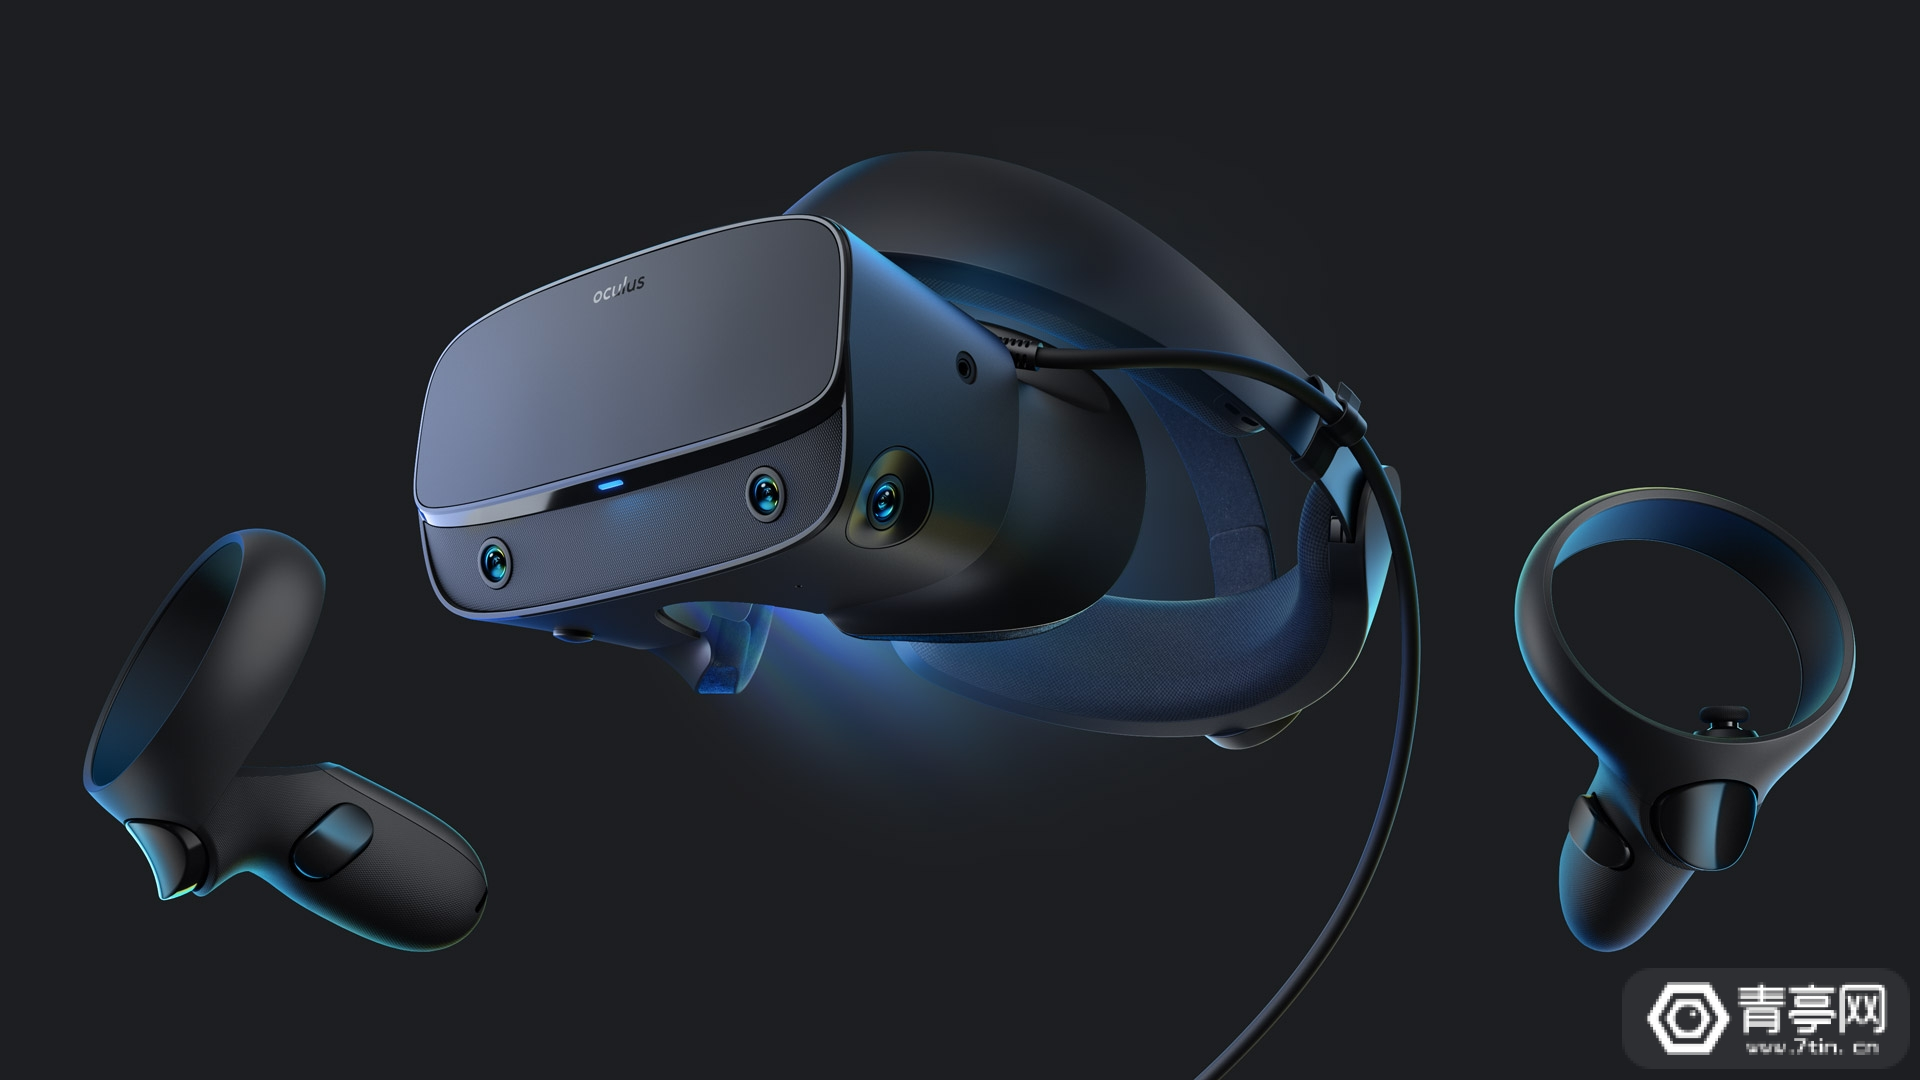 Oculus Rift S已基本售罄,Facebook证实不再继续补货